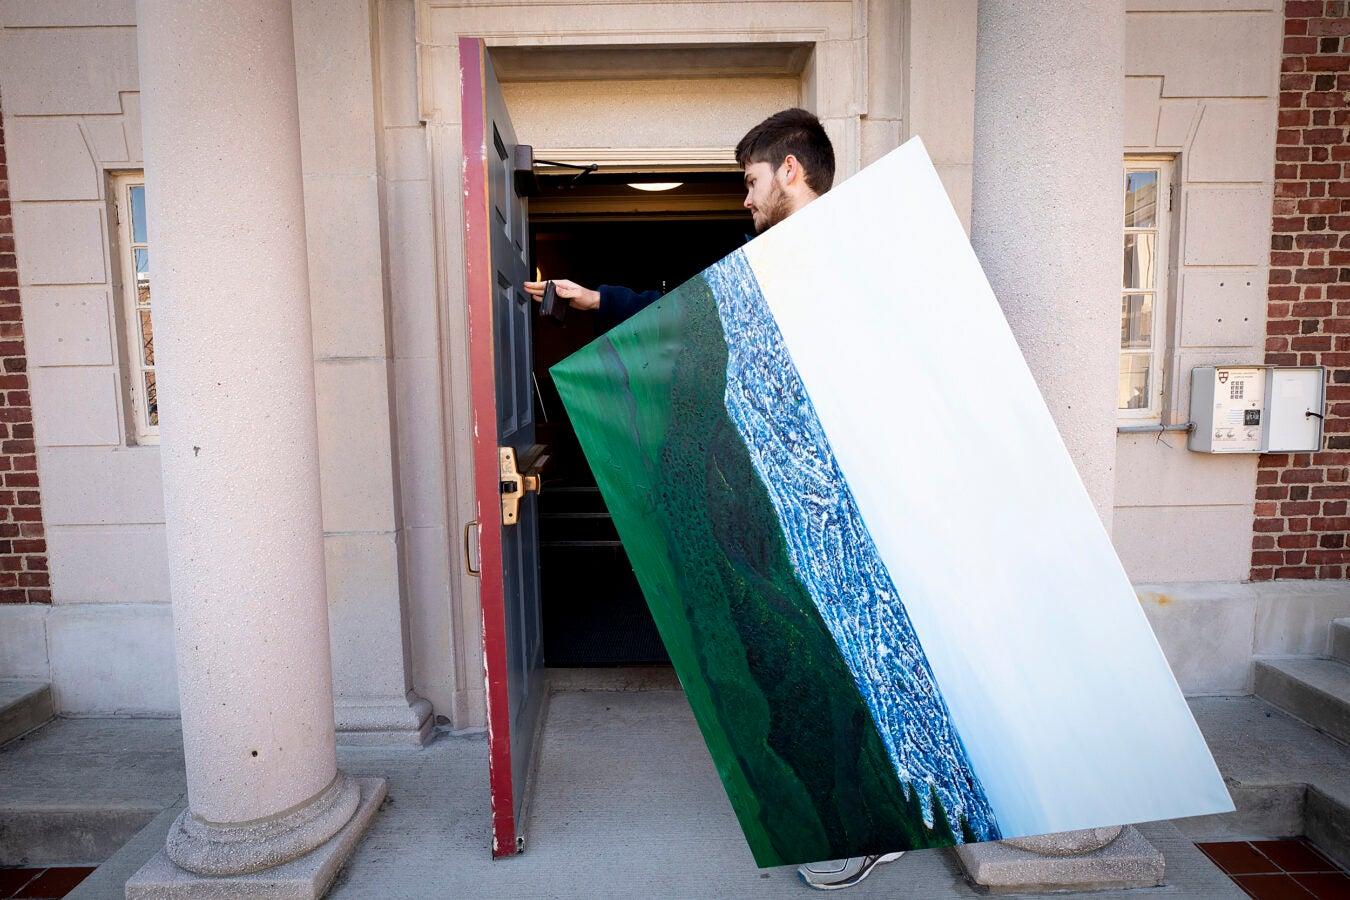 Rodrigo Cordova carries his painting.